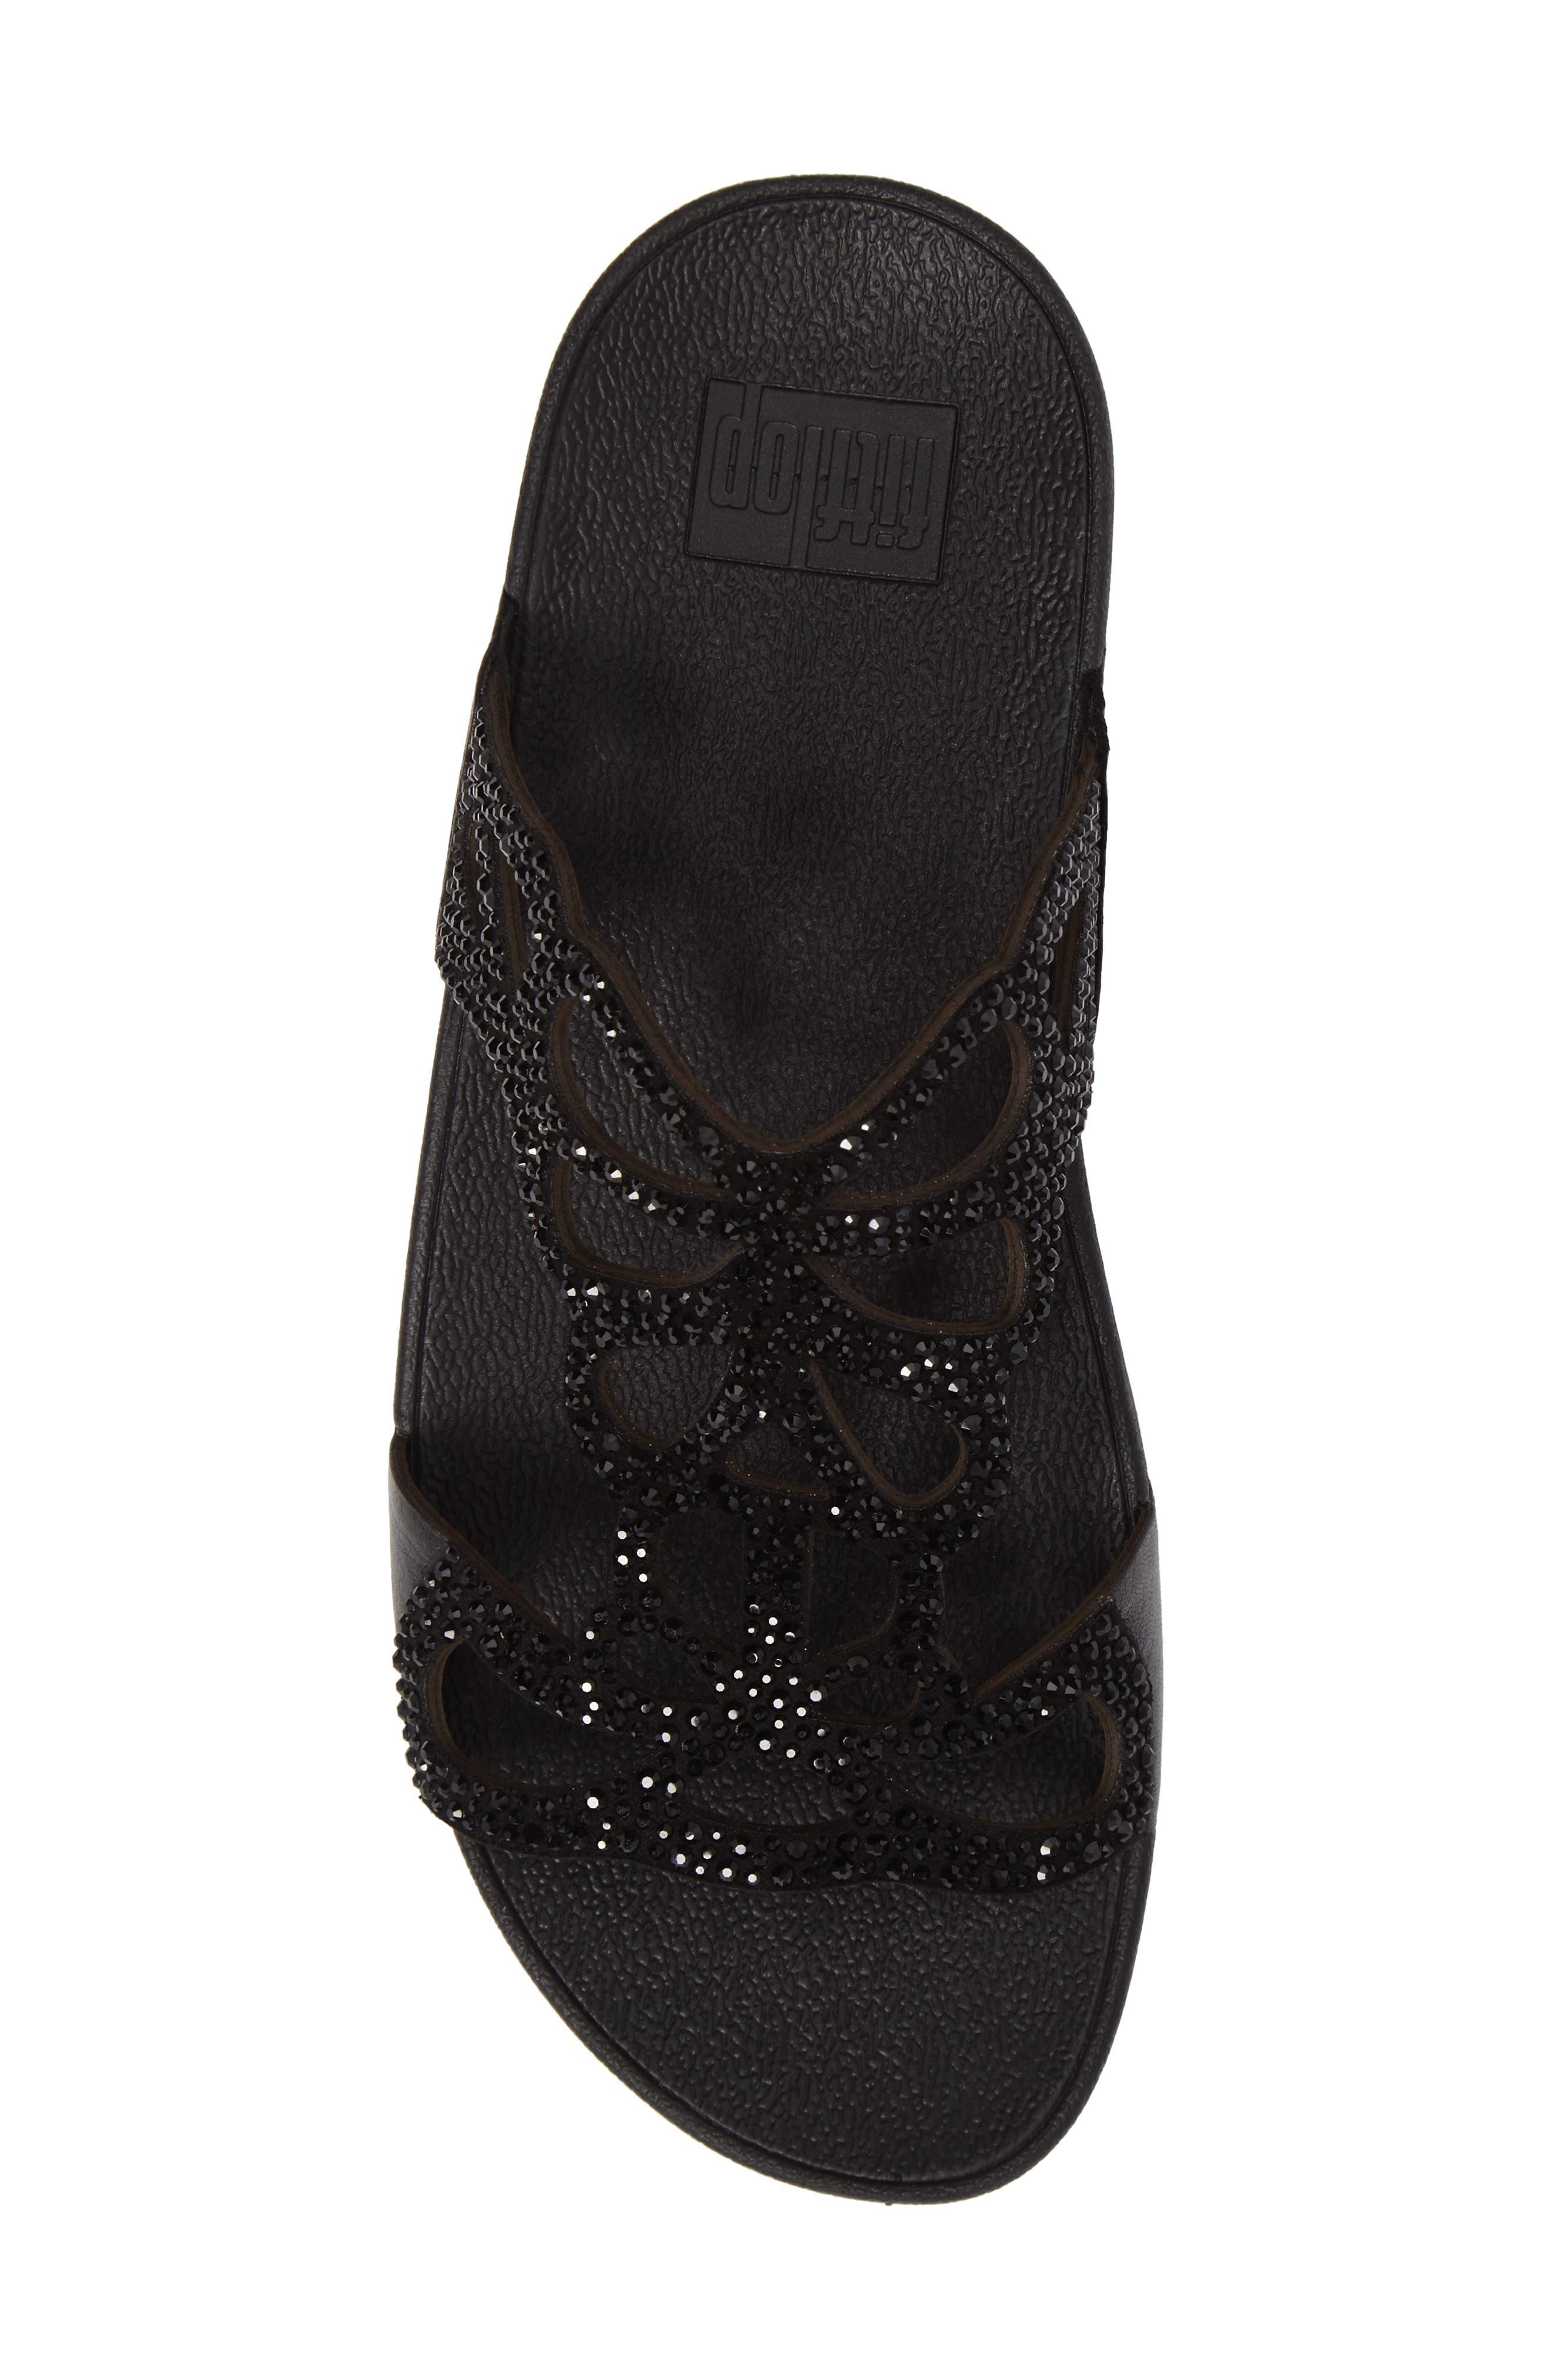 Bumble Wedge Slide Sandal,                             Alternate thumbnail 5, color,                             BLACK LEATHER